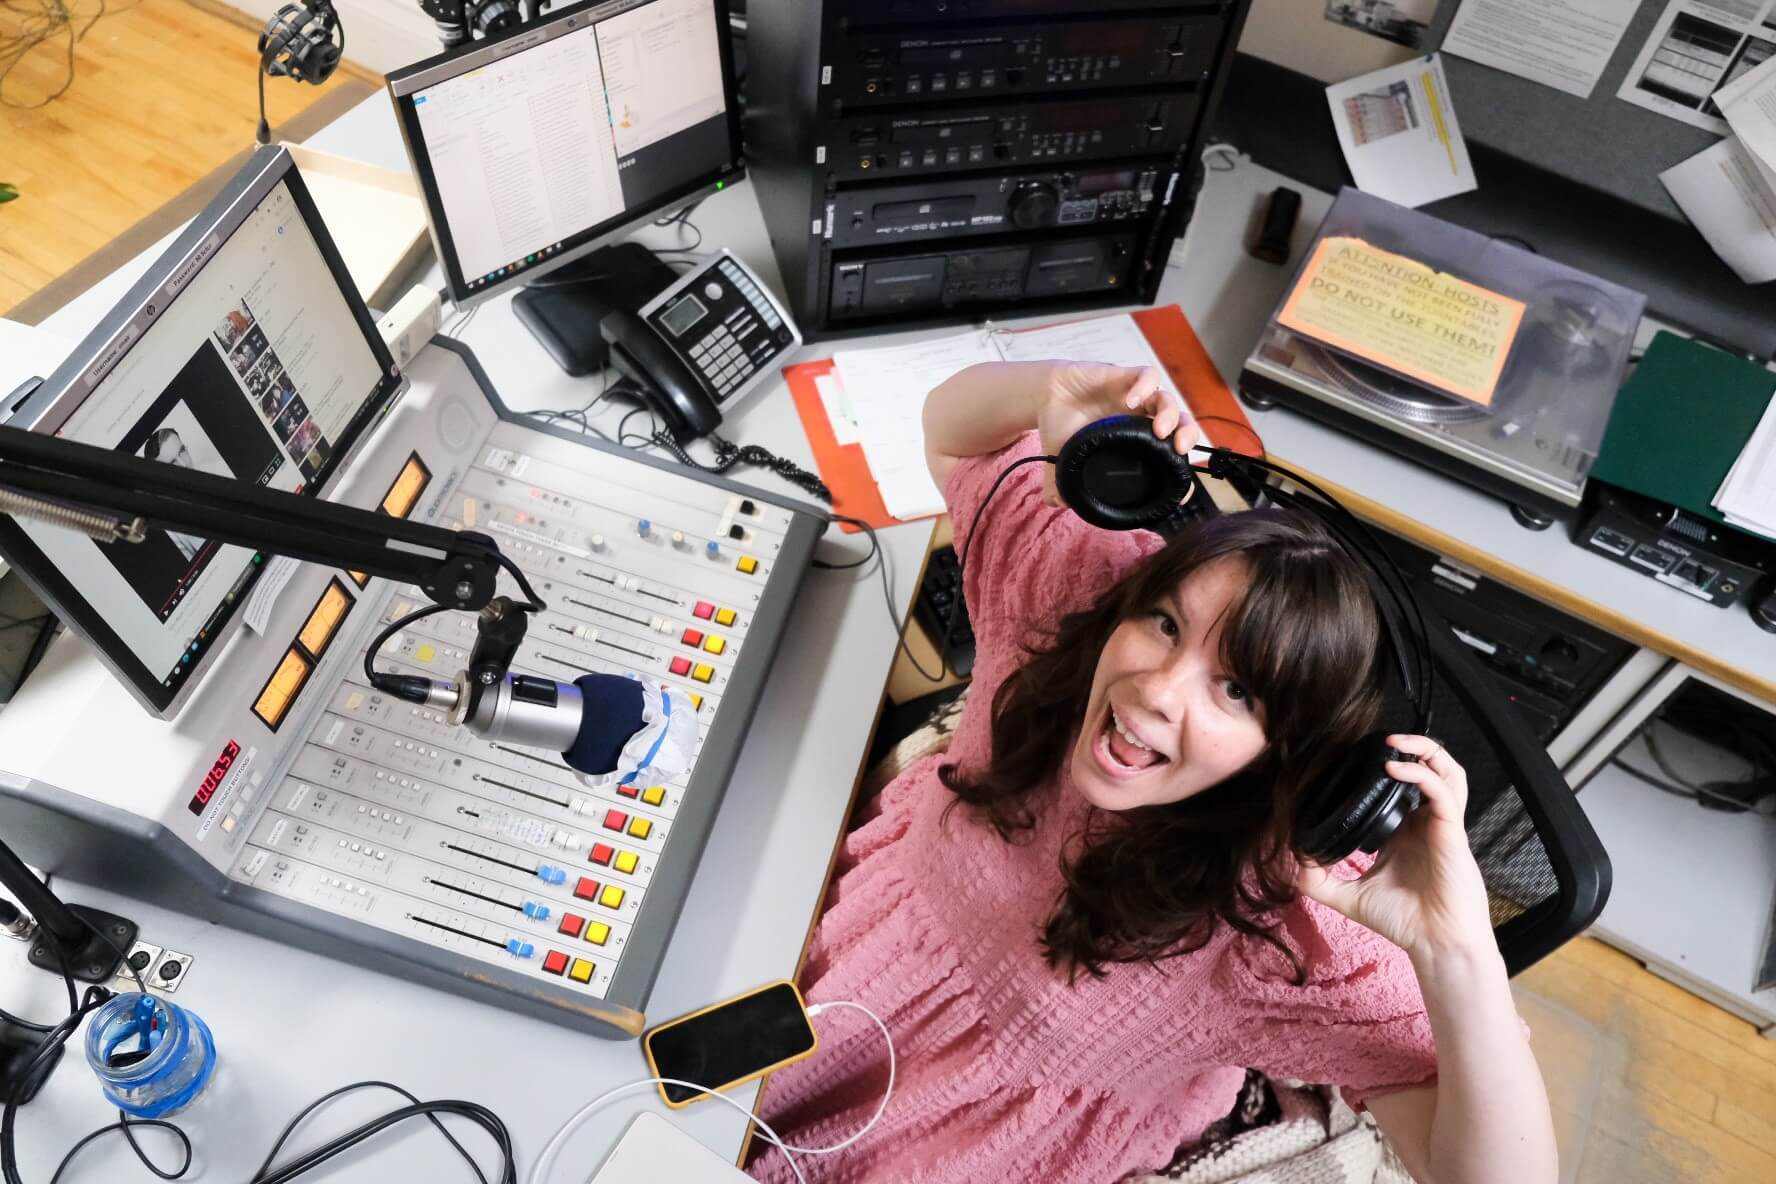 darby sutherland hosting thrice inside saskatoon community radio station